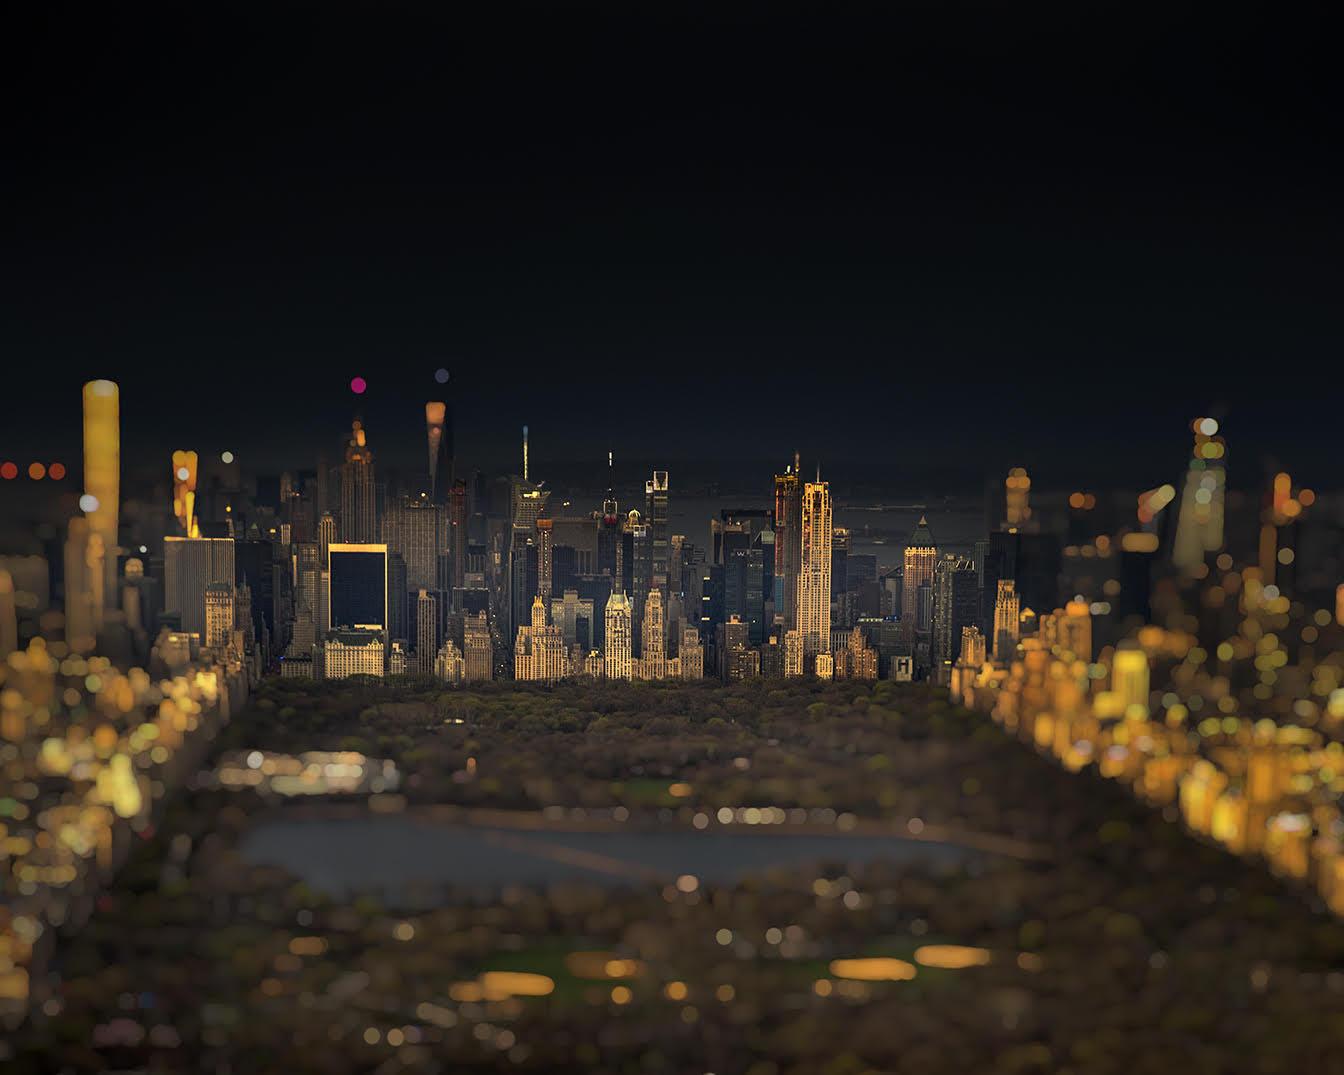 Machina Mundi NYC 0 3 - Grande - Plate 01